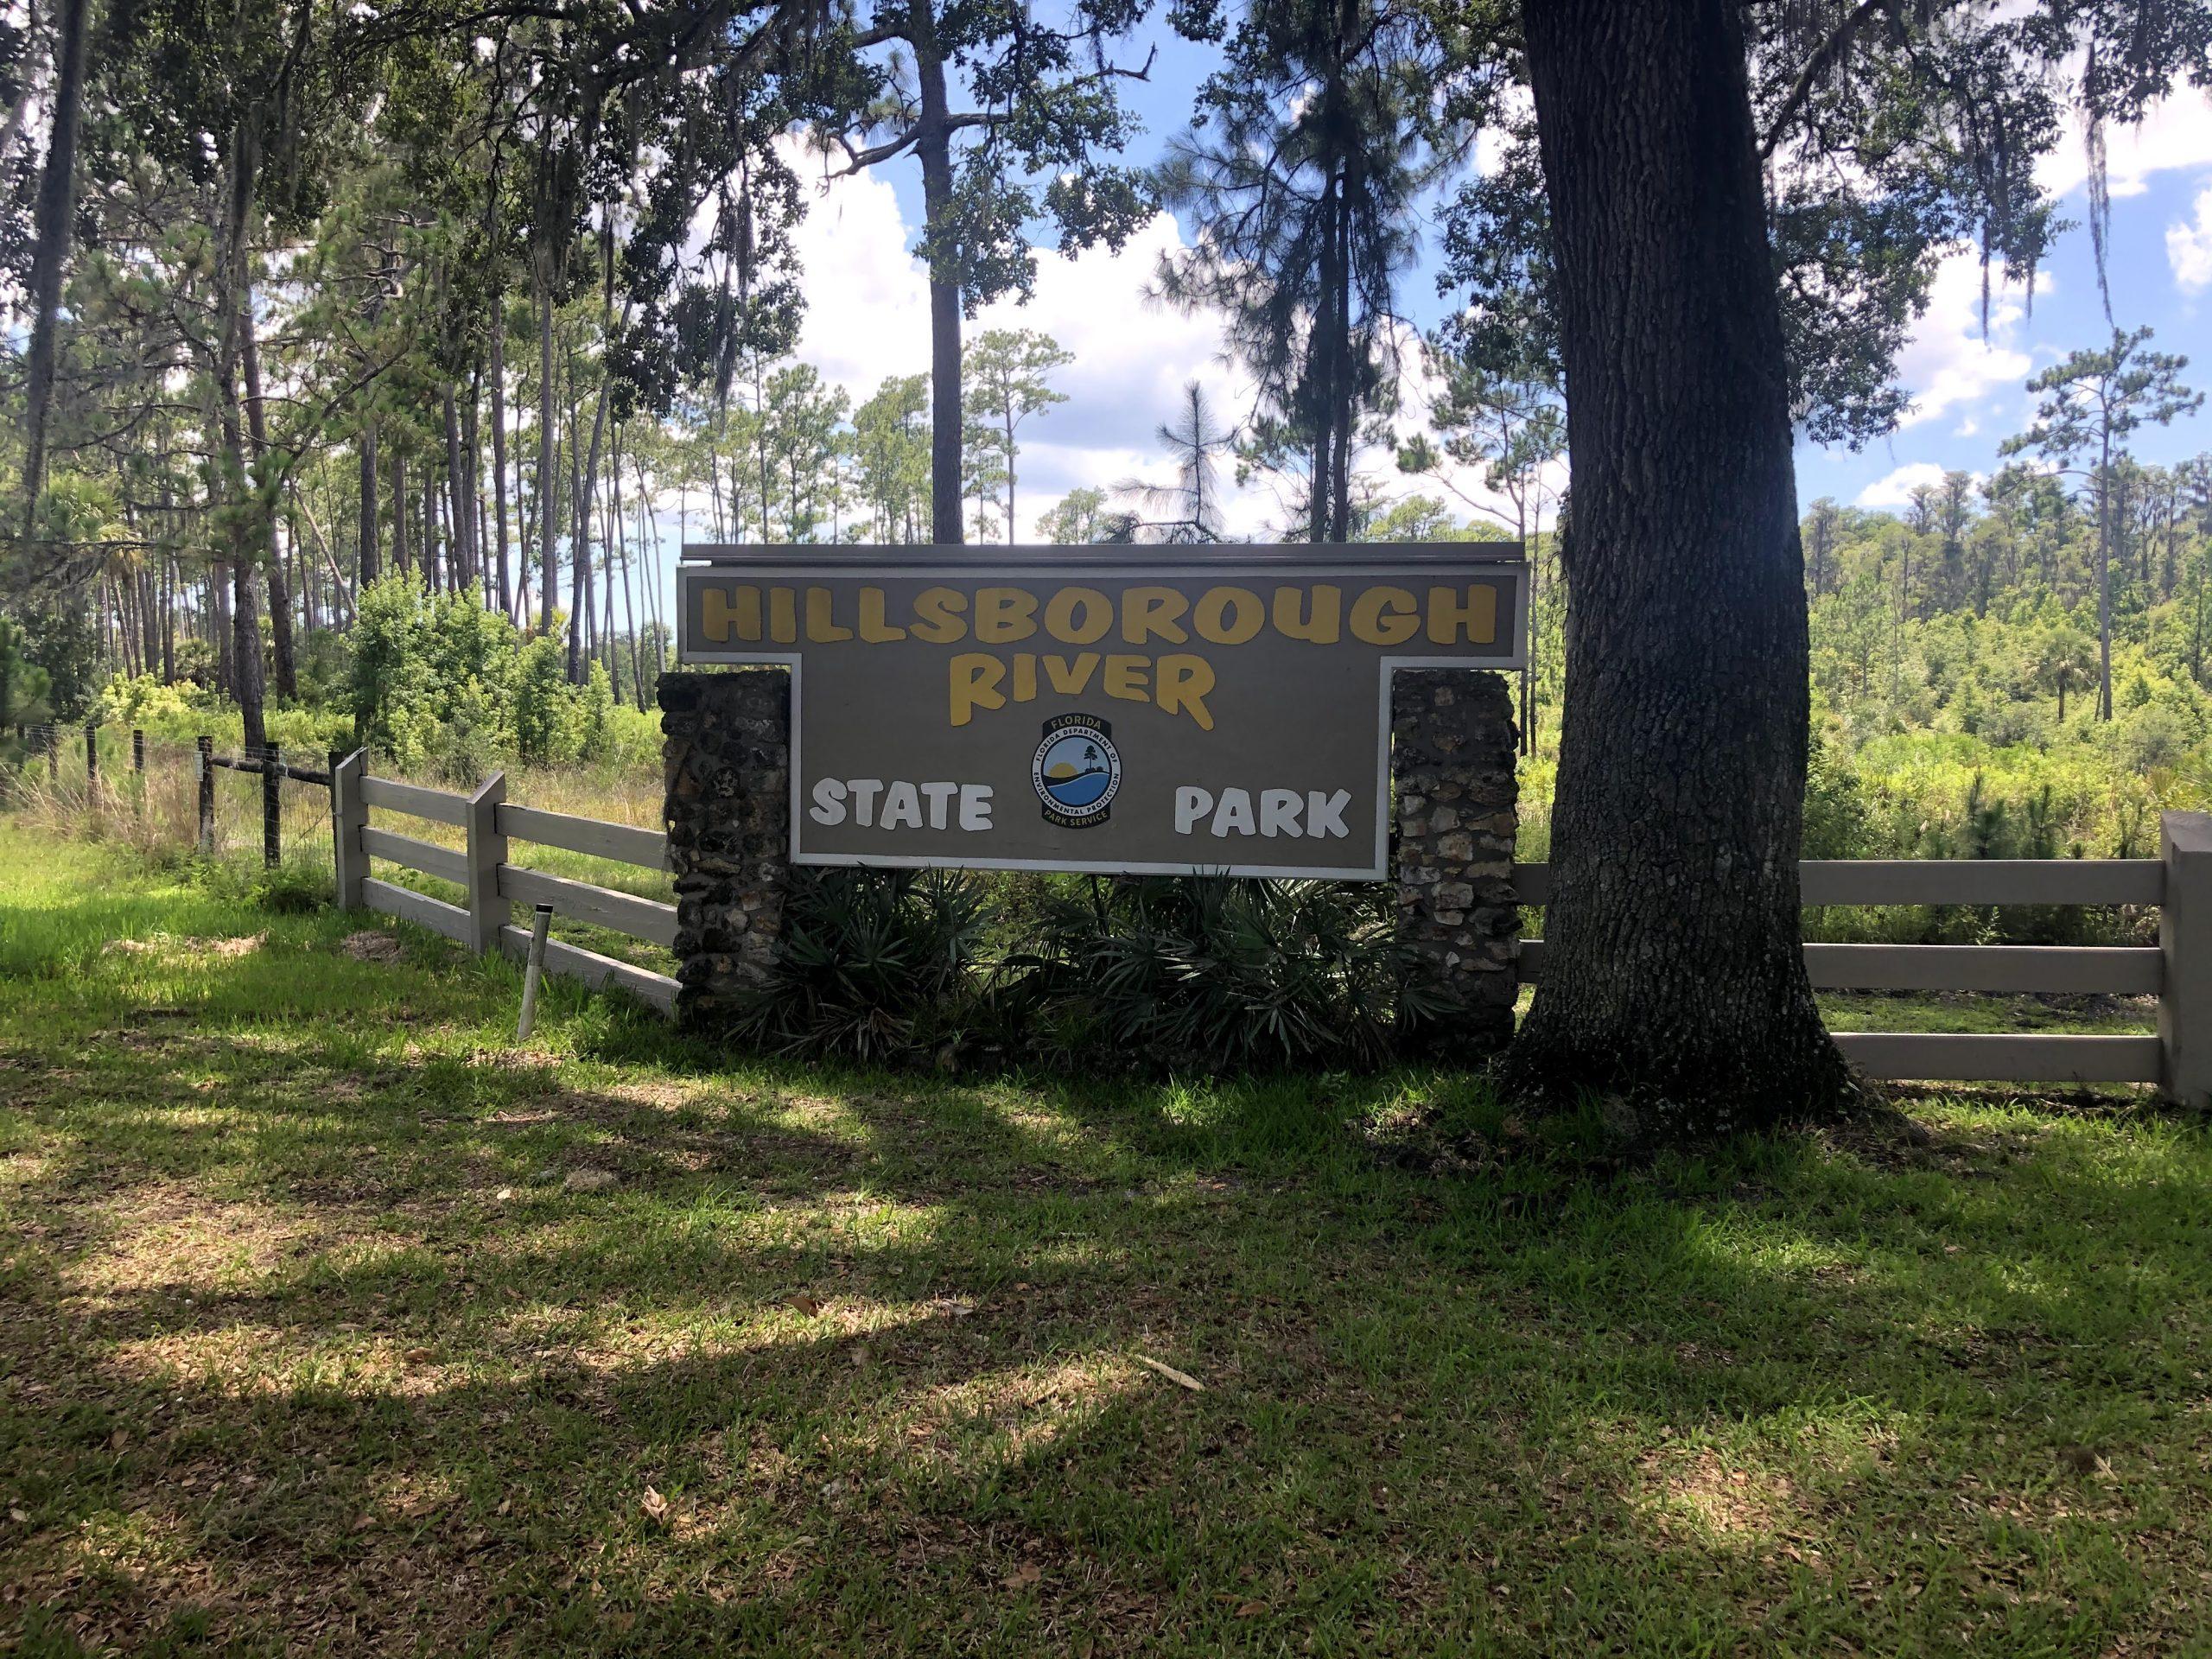 Alligator Chase Part Two: Hillsborough River State Park